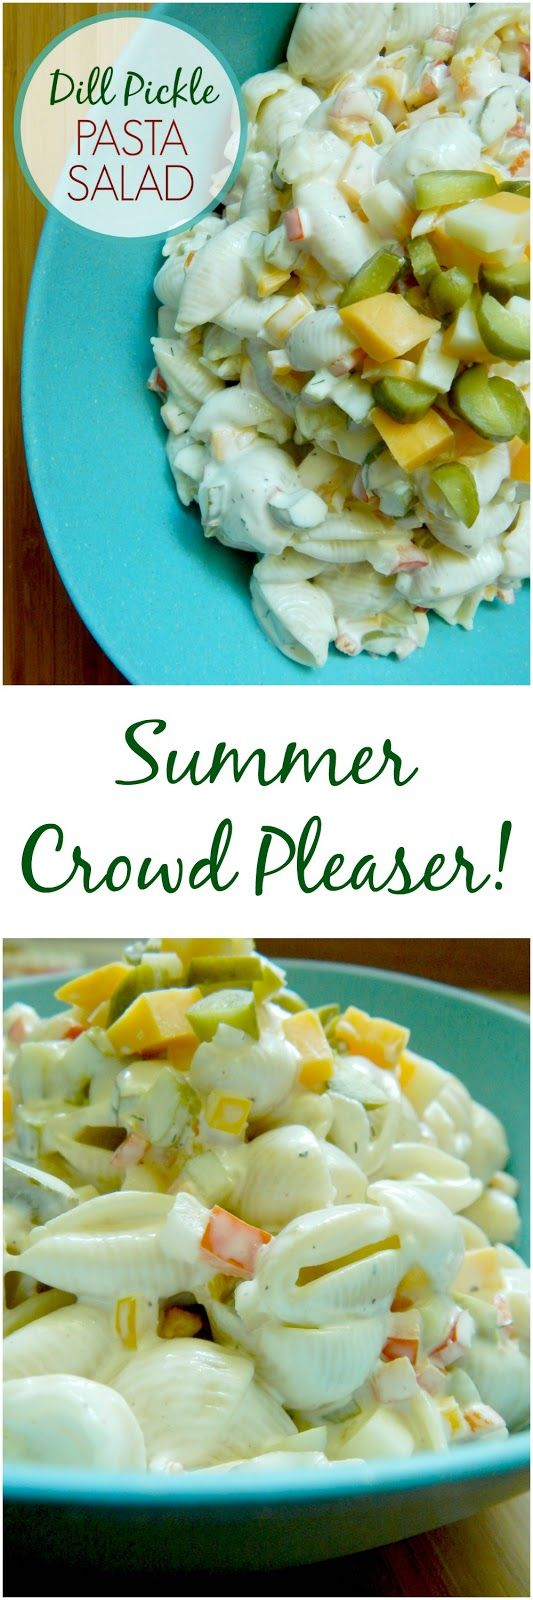 dill pickle pasta salad (sweetandsavoryfood.com)